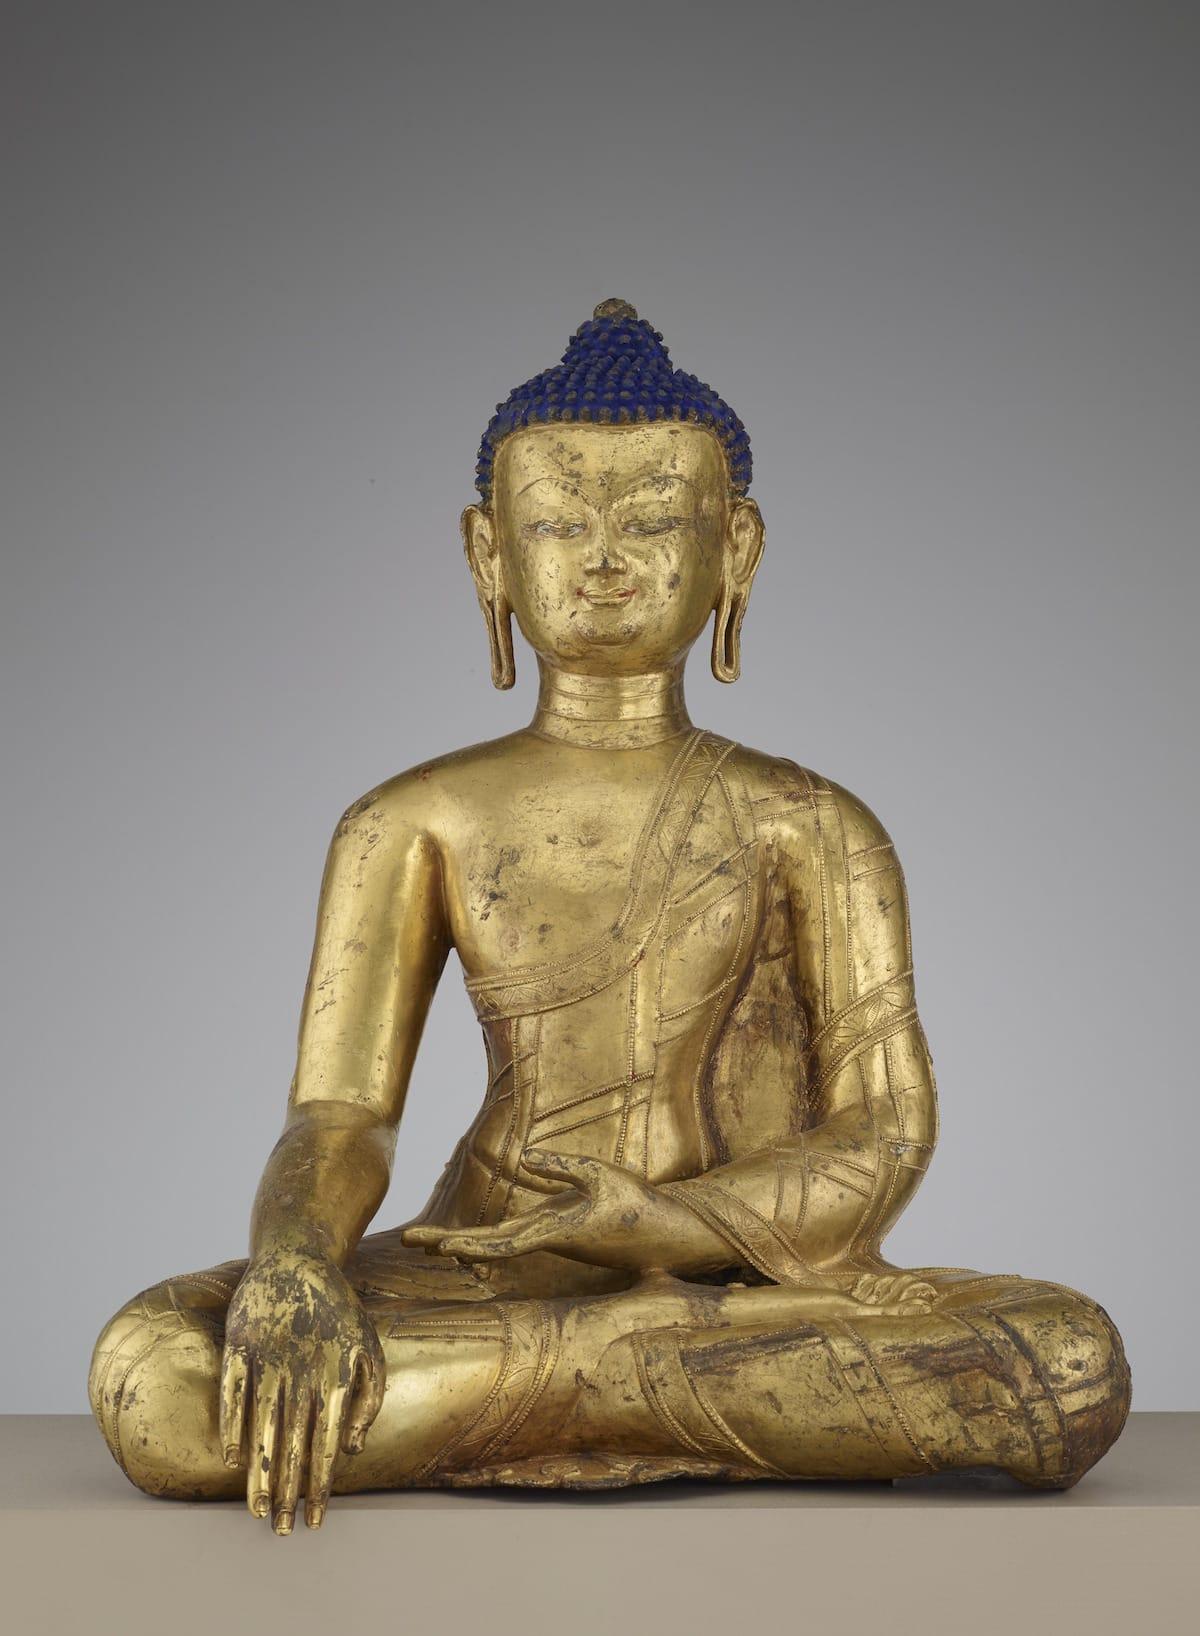 Buddhadharma Buddha Chögyam Trungpa Rinpoche Lineage Reginald A. Ray Theravada Vajrayana / Tibetan Buddhism Zen Lion's Roar Buddhism